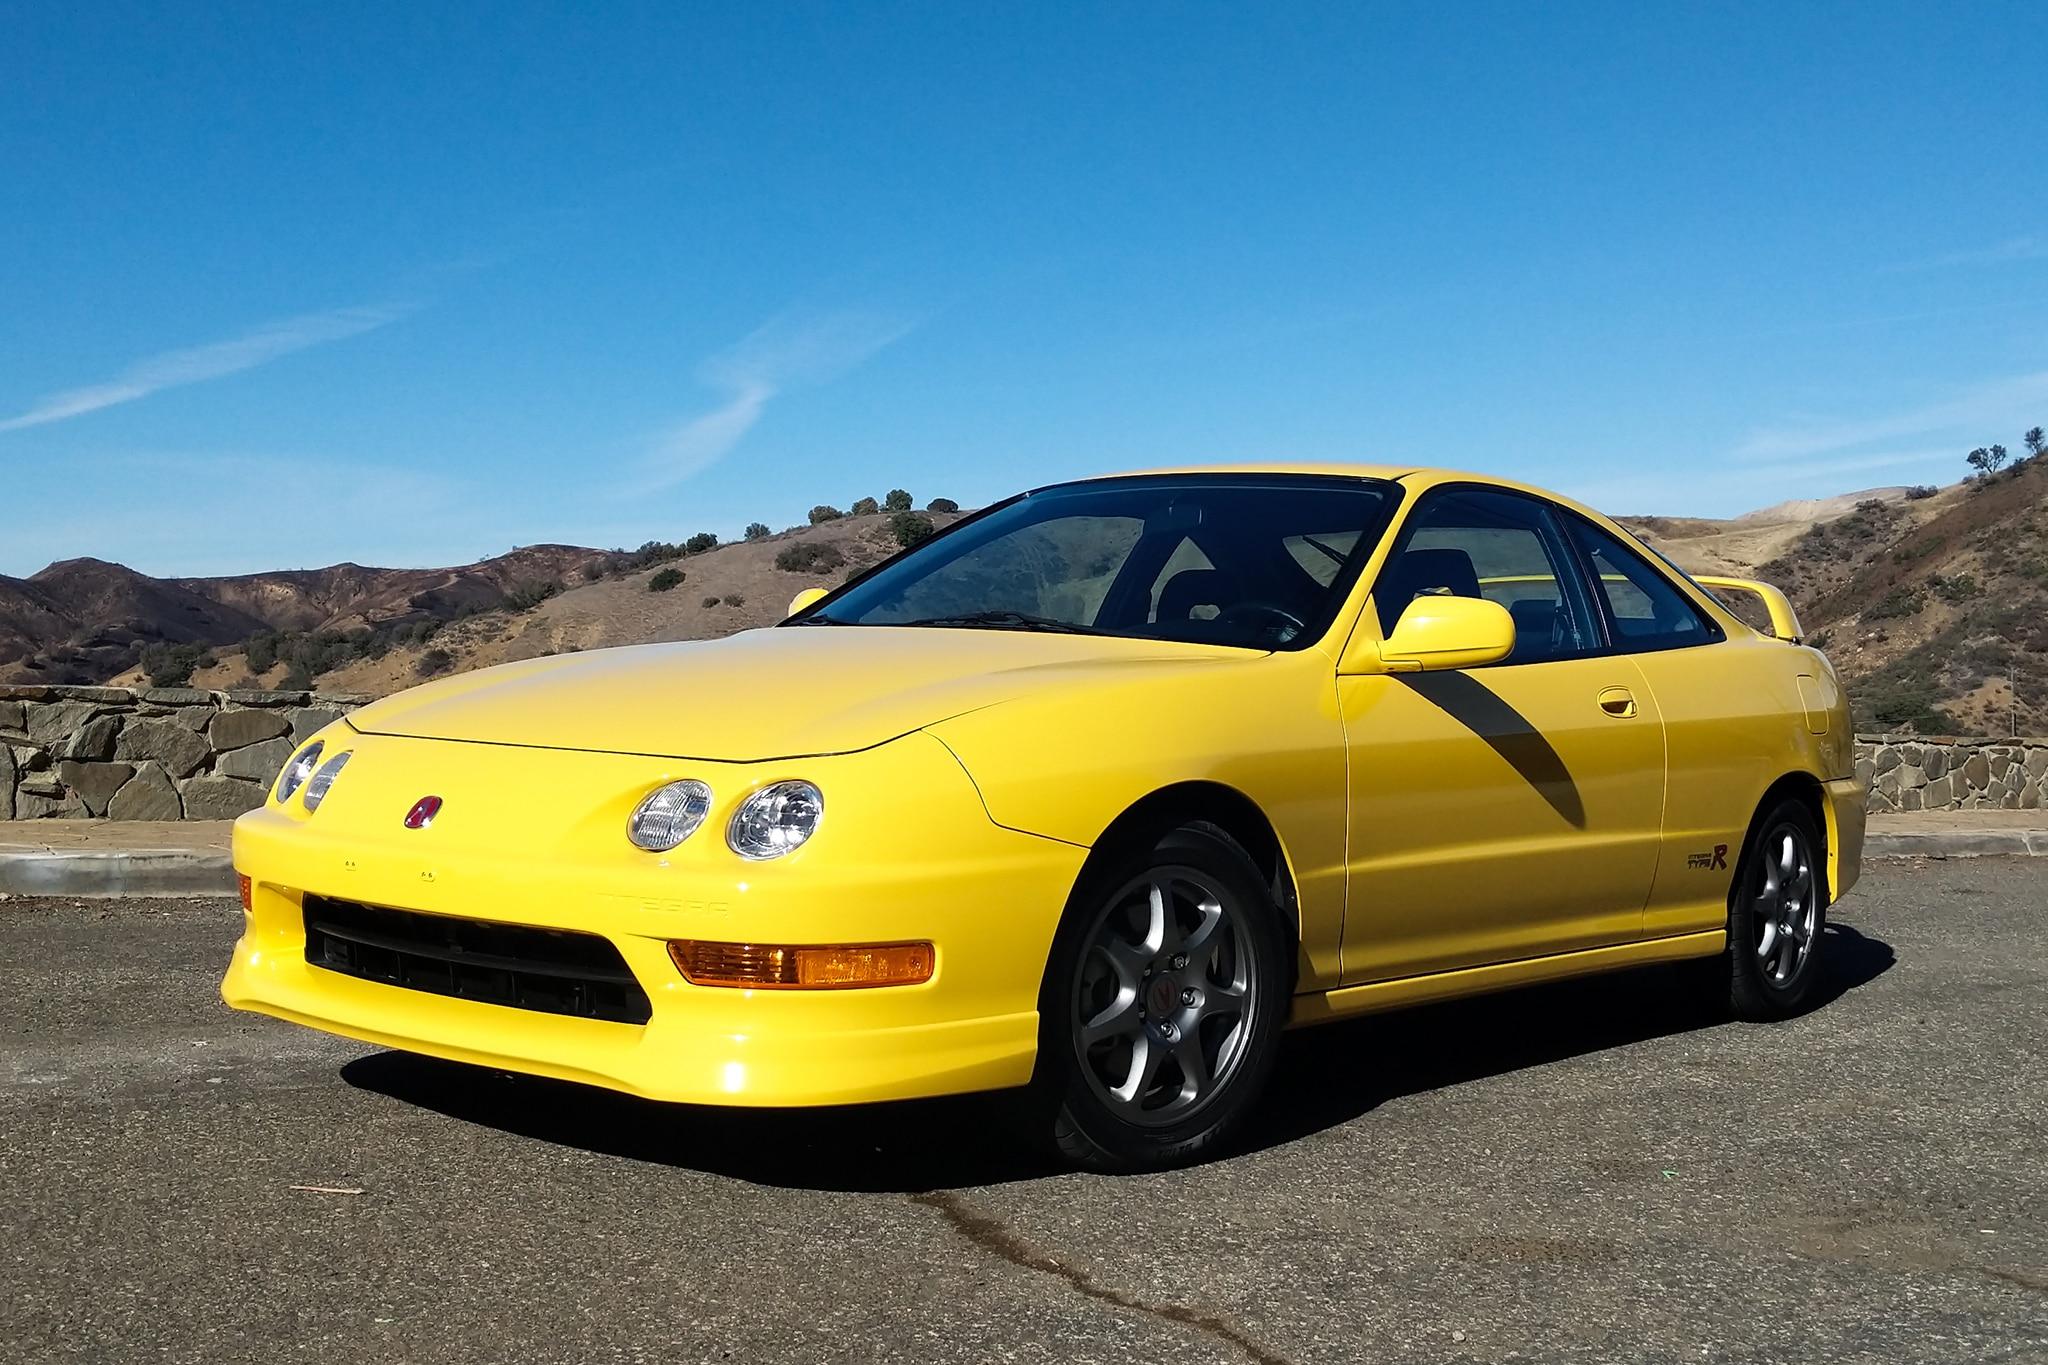 2001 Acura Integra Type R 3